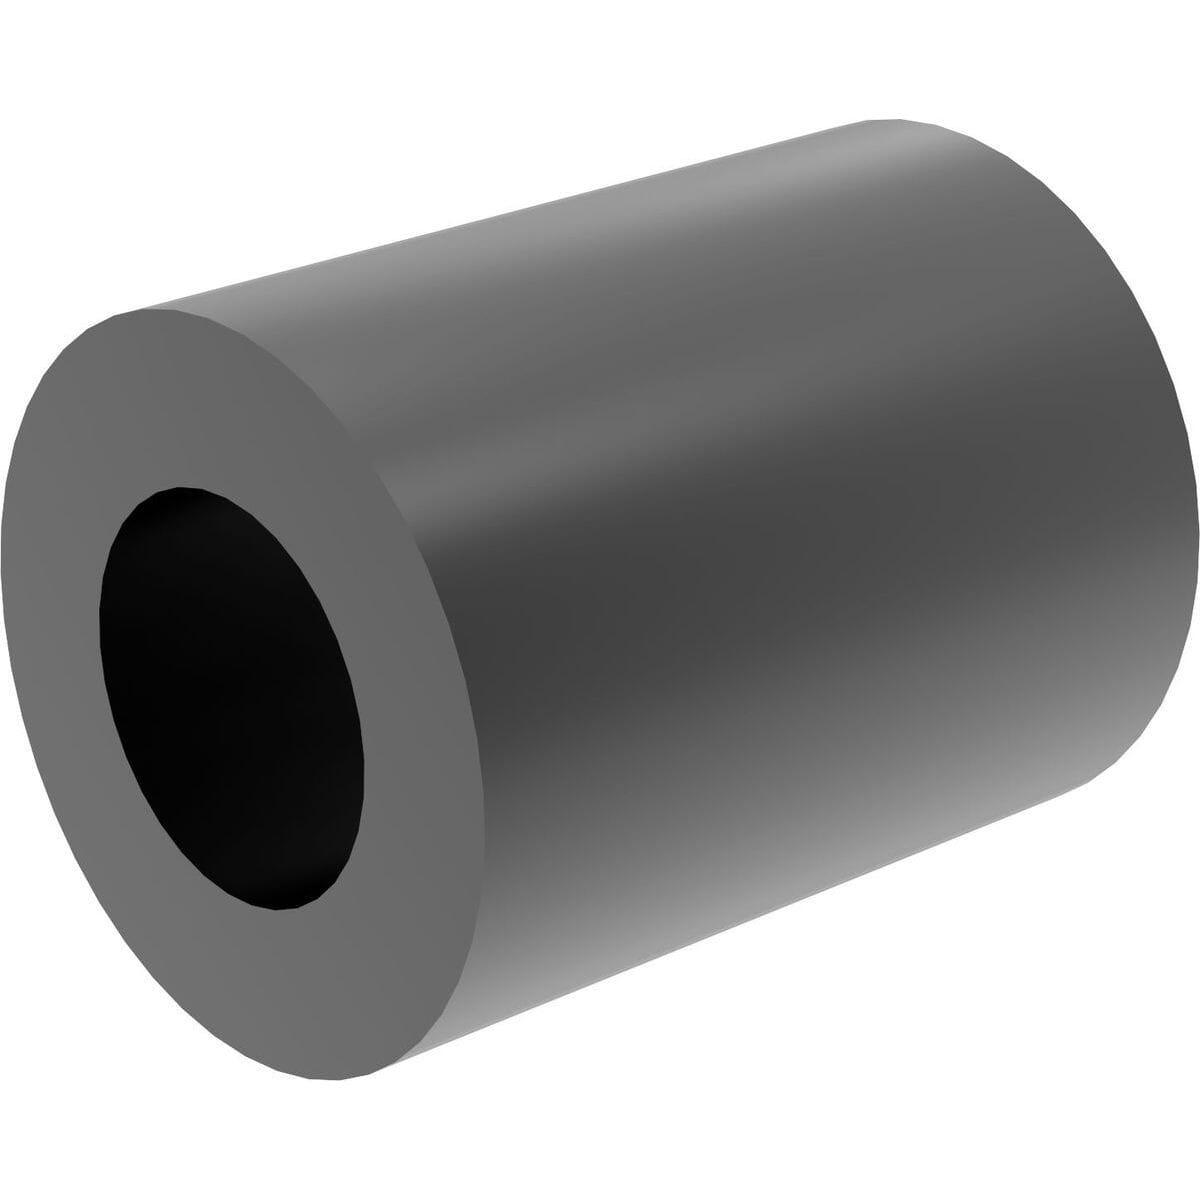 10mm x 8.2mm x 20mm Spacers - Black Nylon